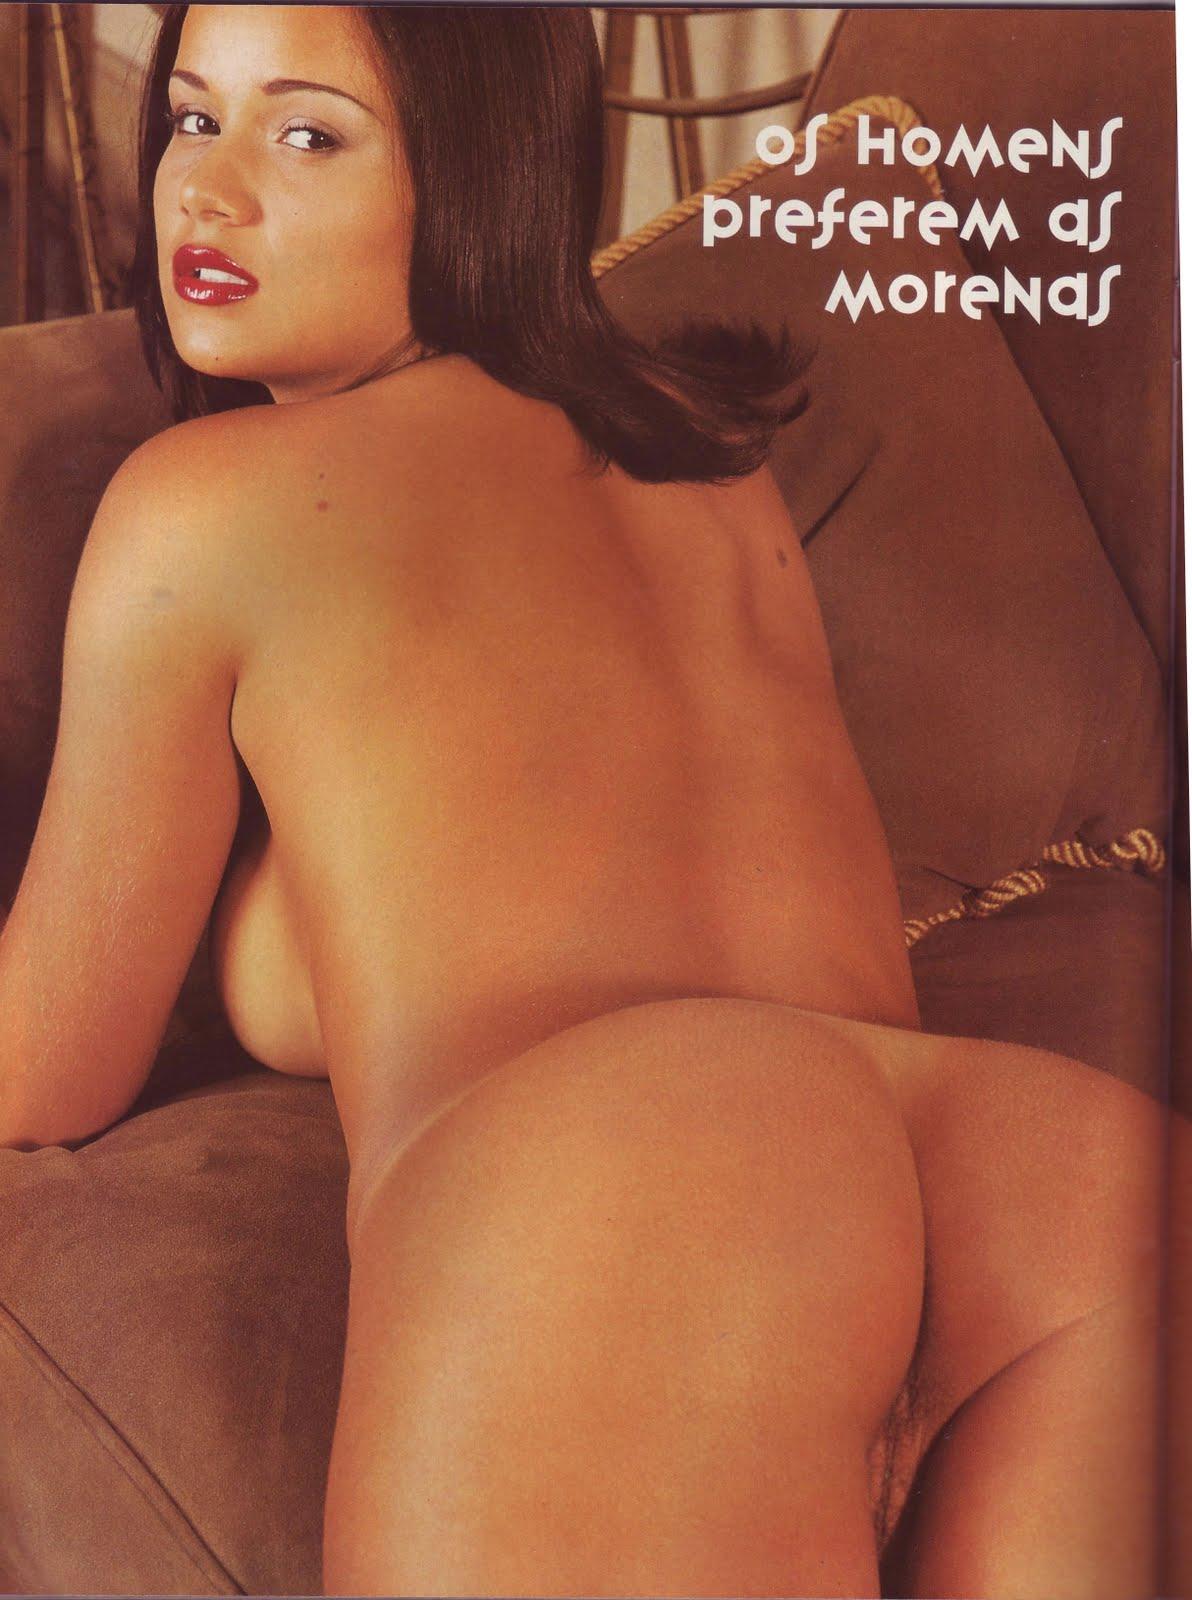 patricia-santana-erotika